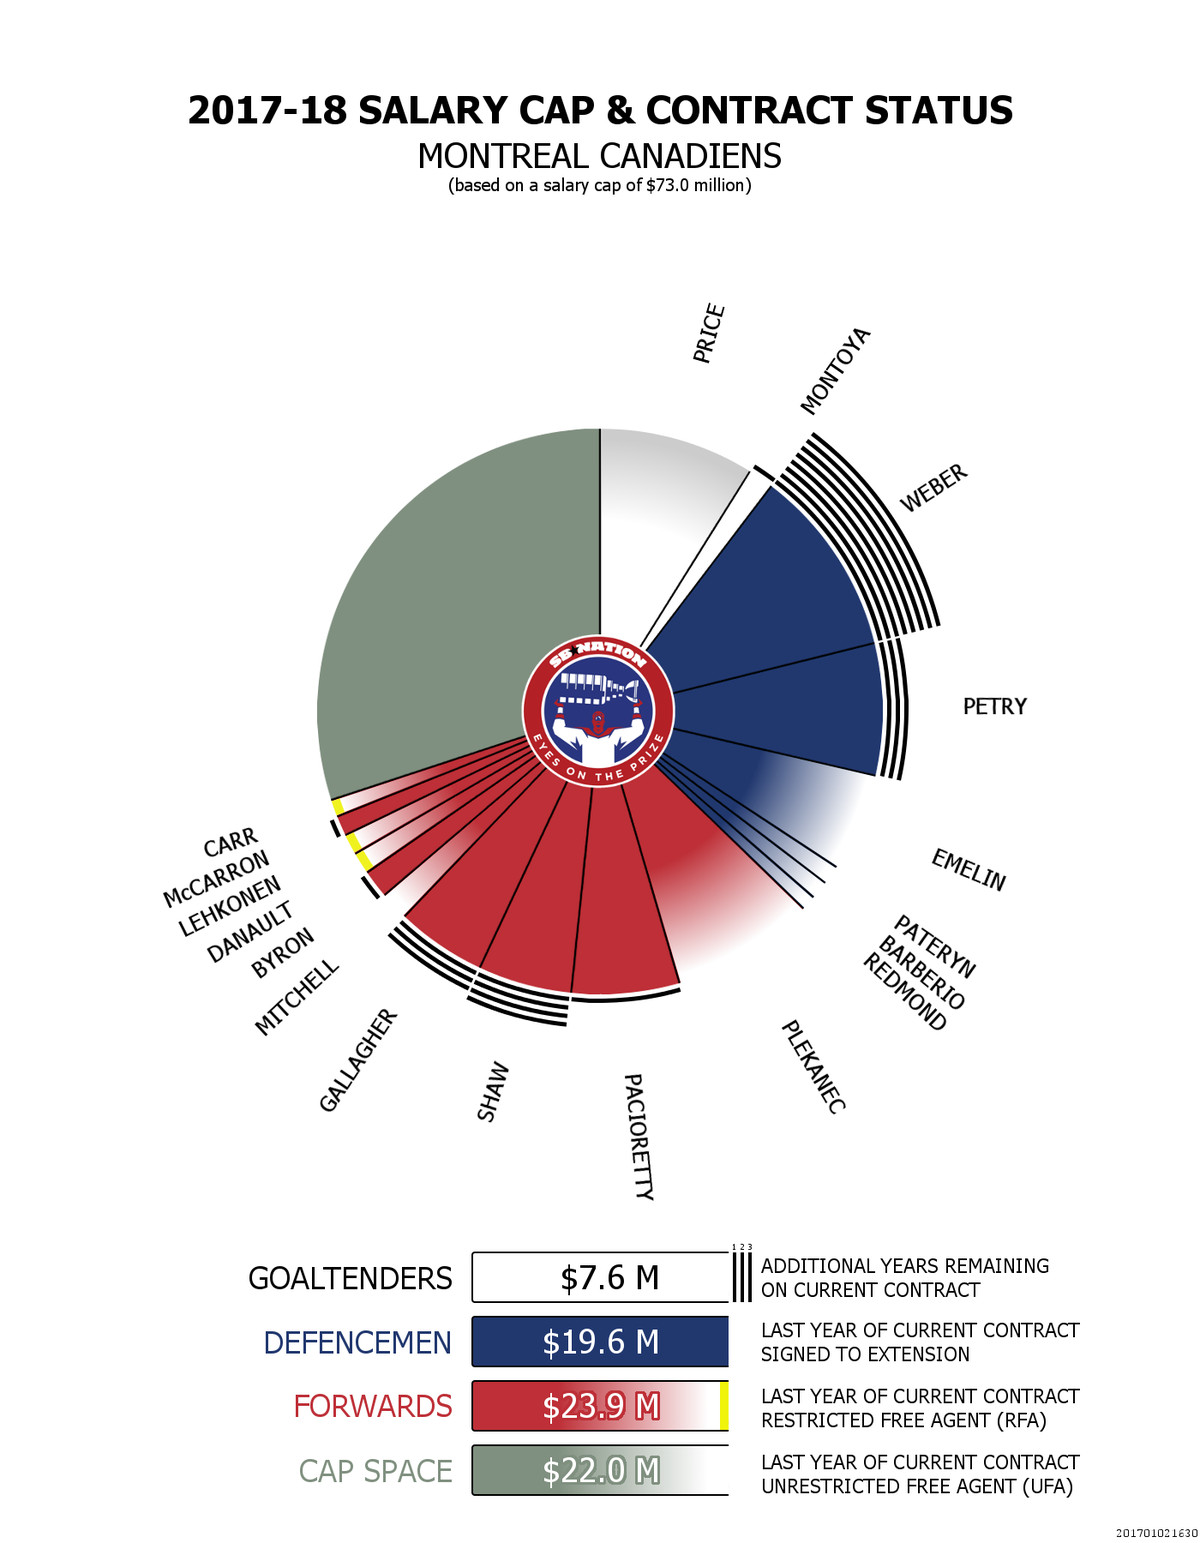 Canadiens 2017-18 salary cap visualization